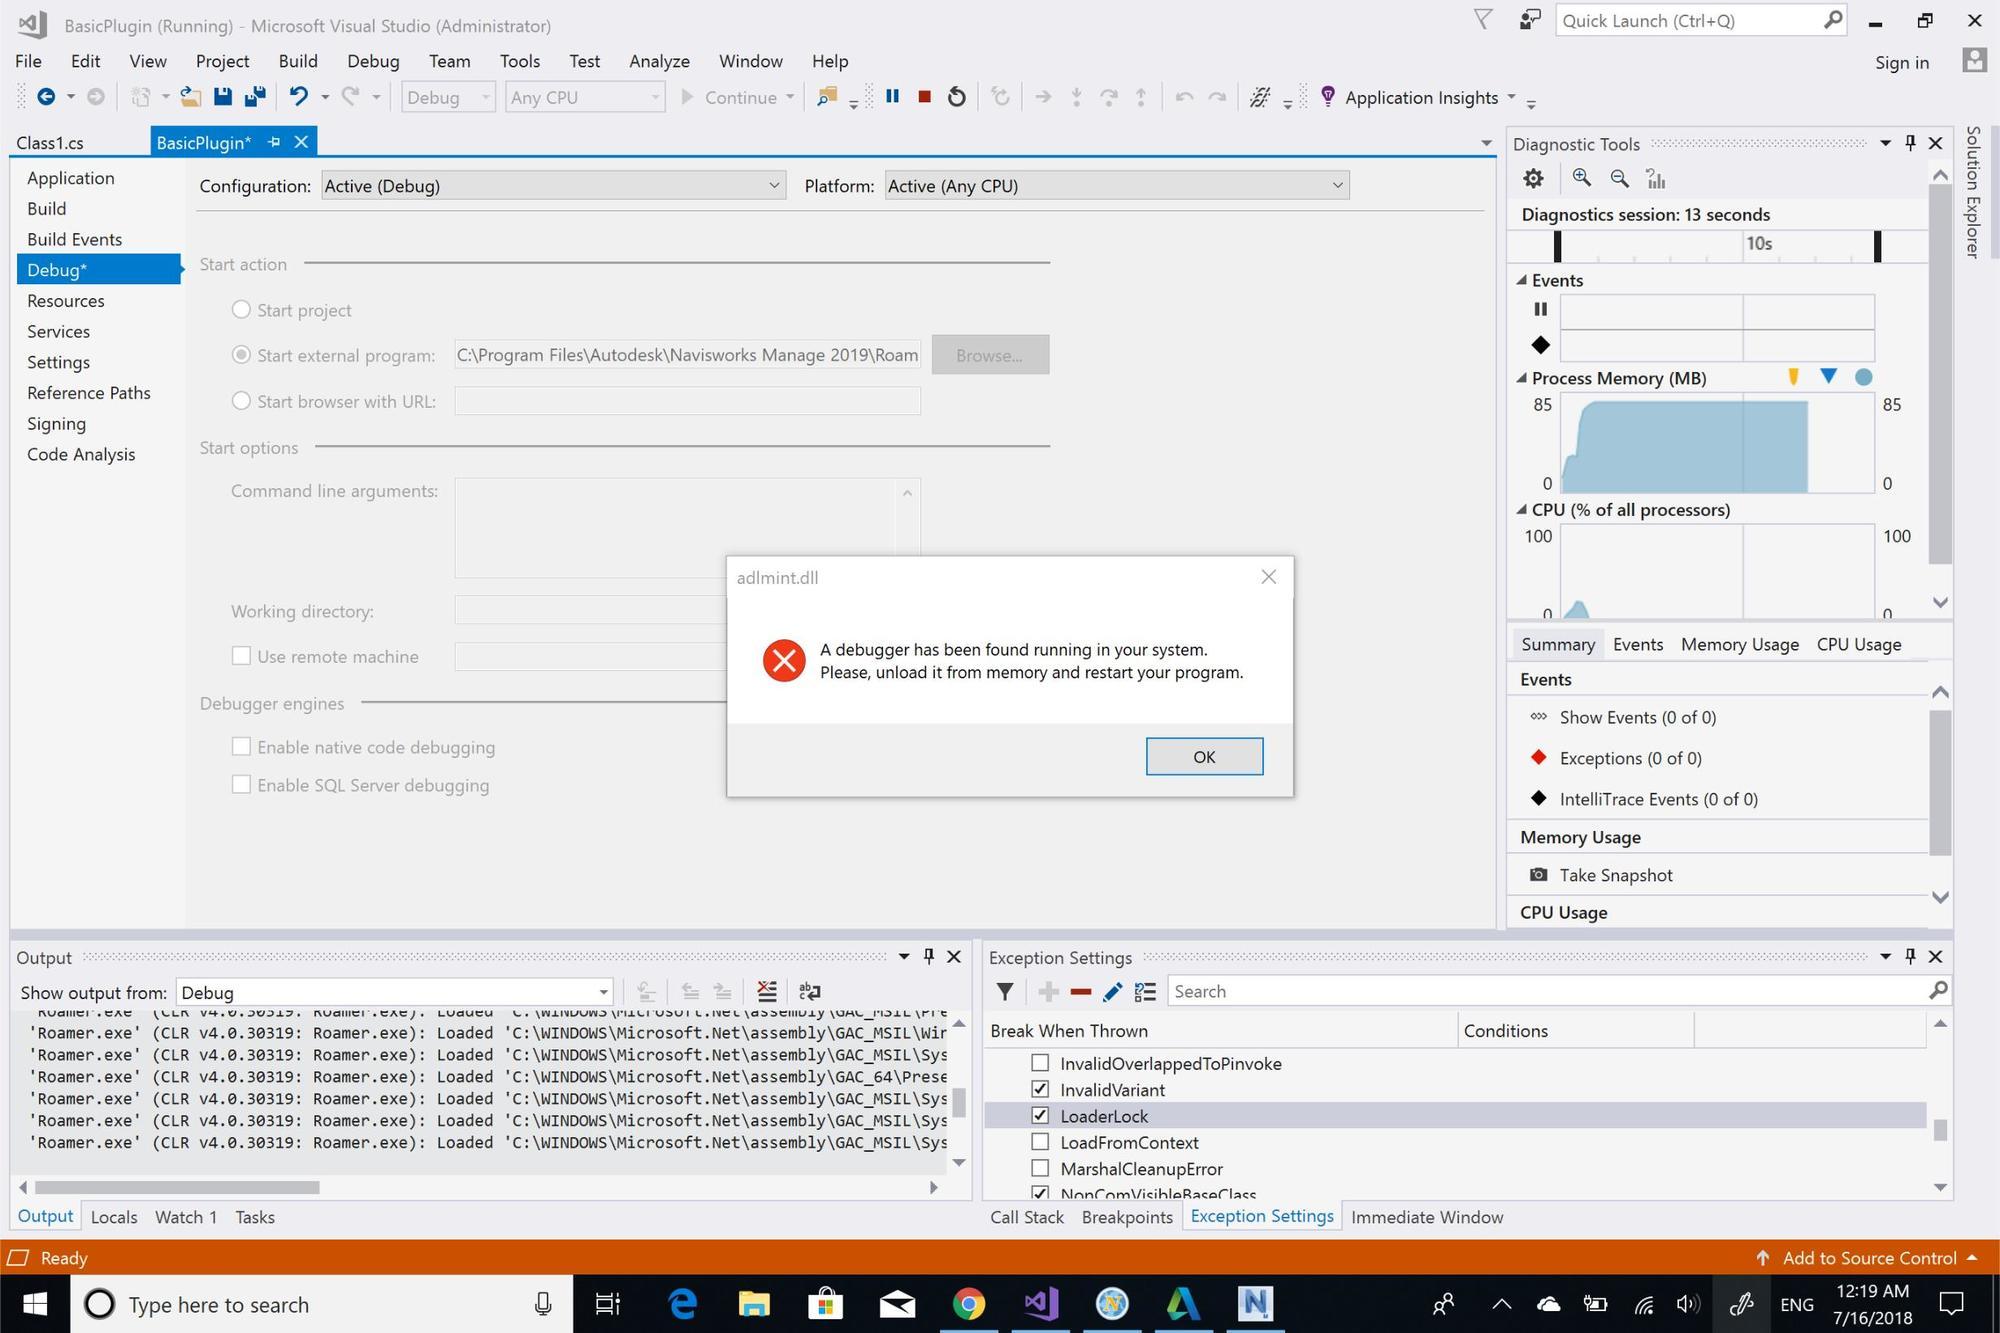 Outlook 2019  new featiure - but language problem. Excel 2019 great c7f37f6e-f5b6-4b33-944d-9be59677ba04?upload=true.jpg